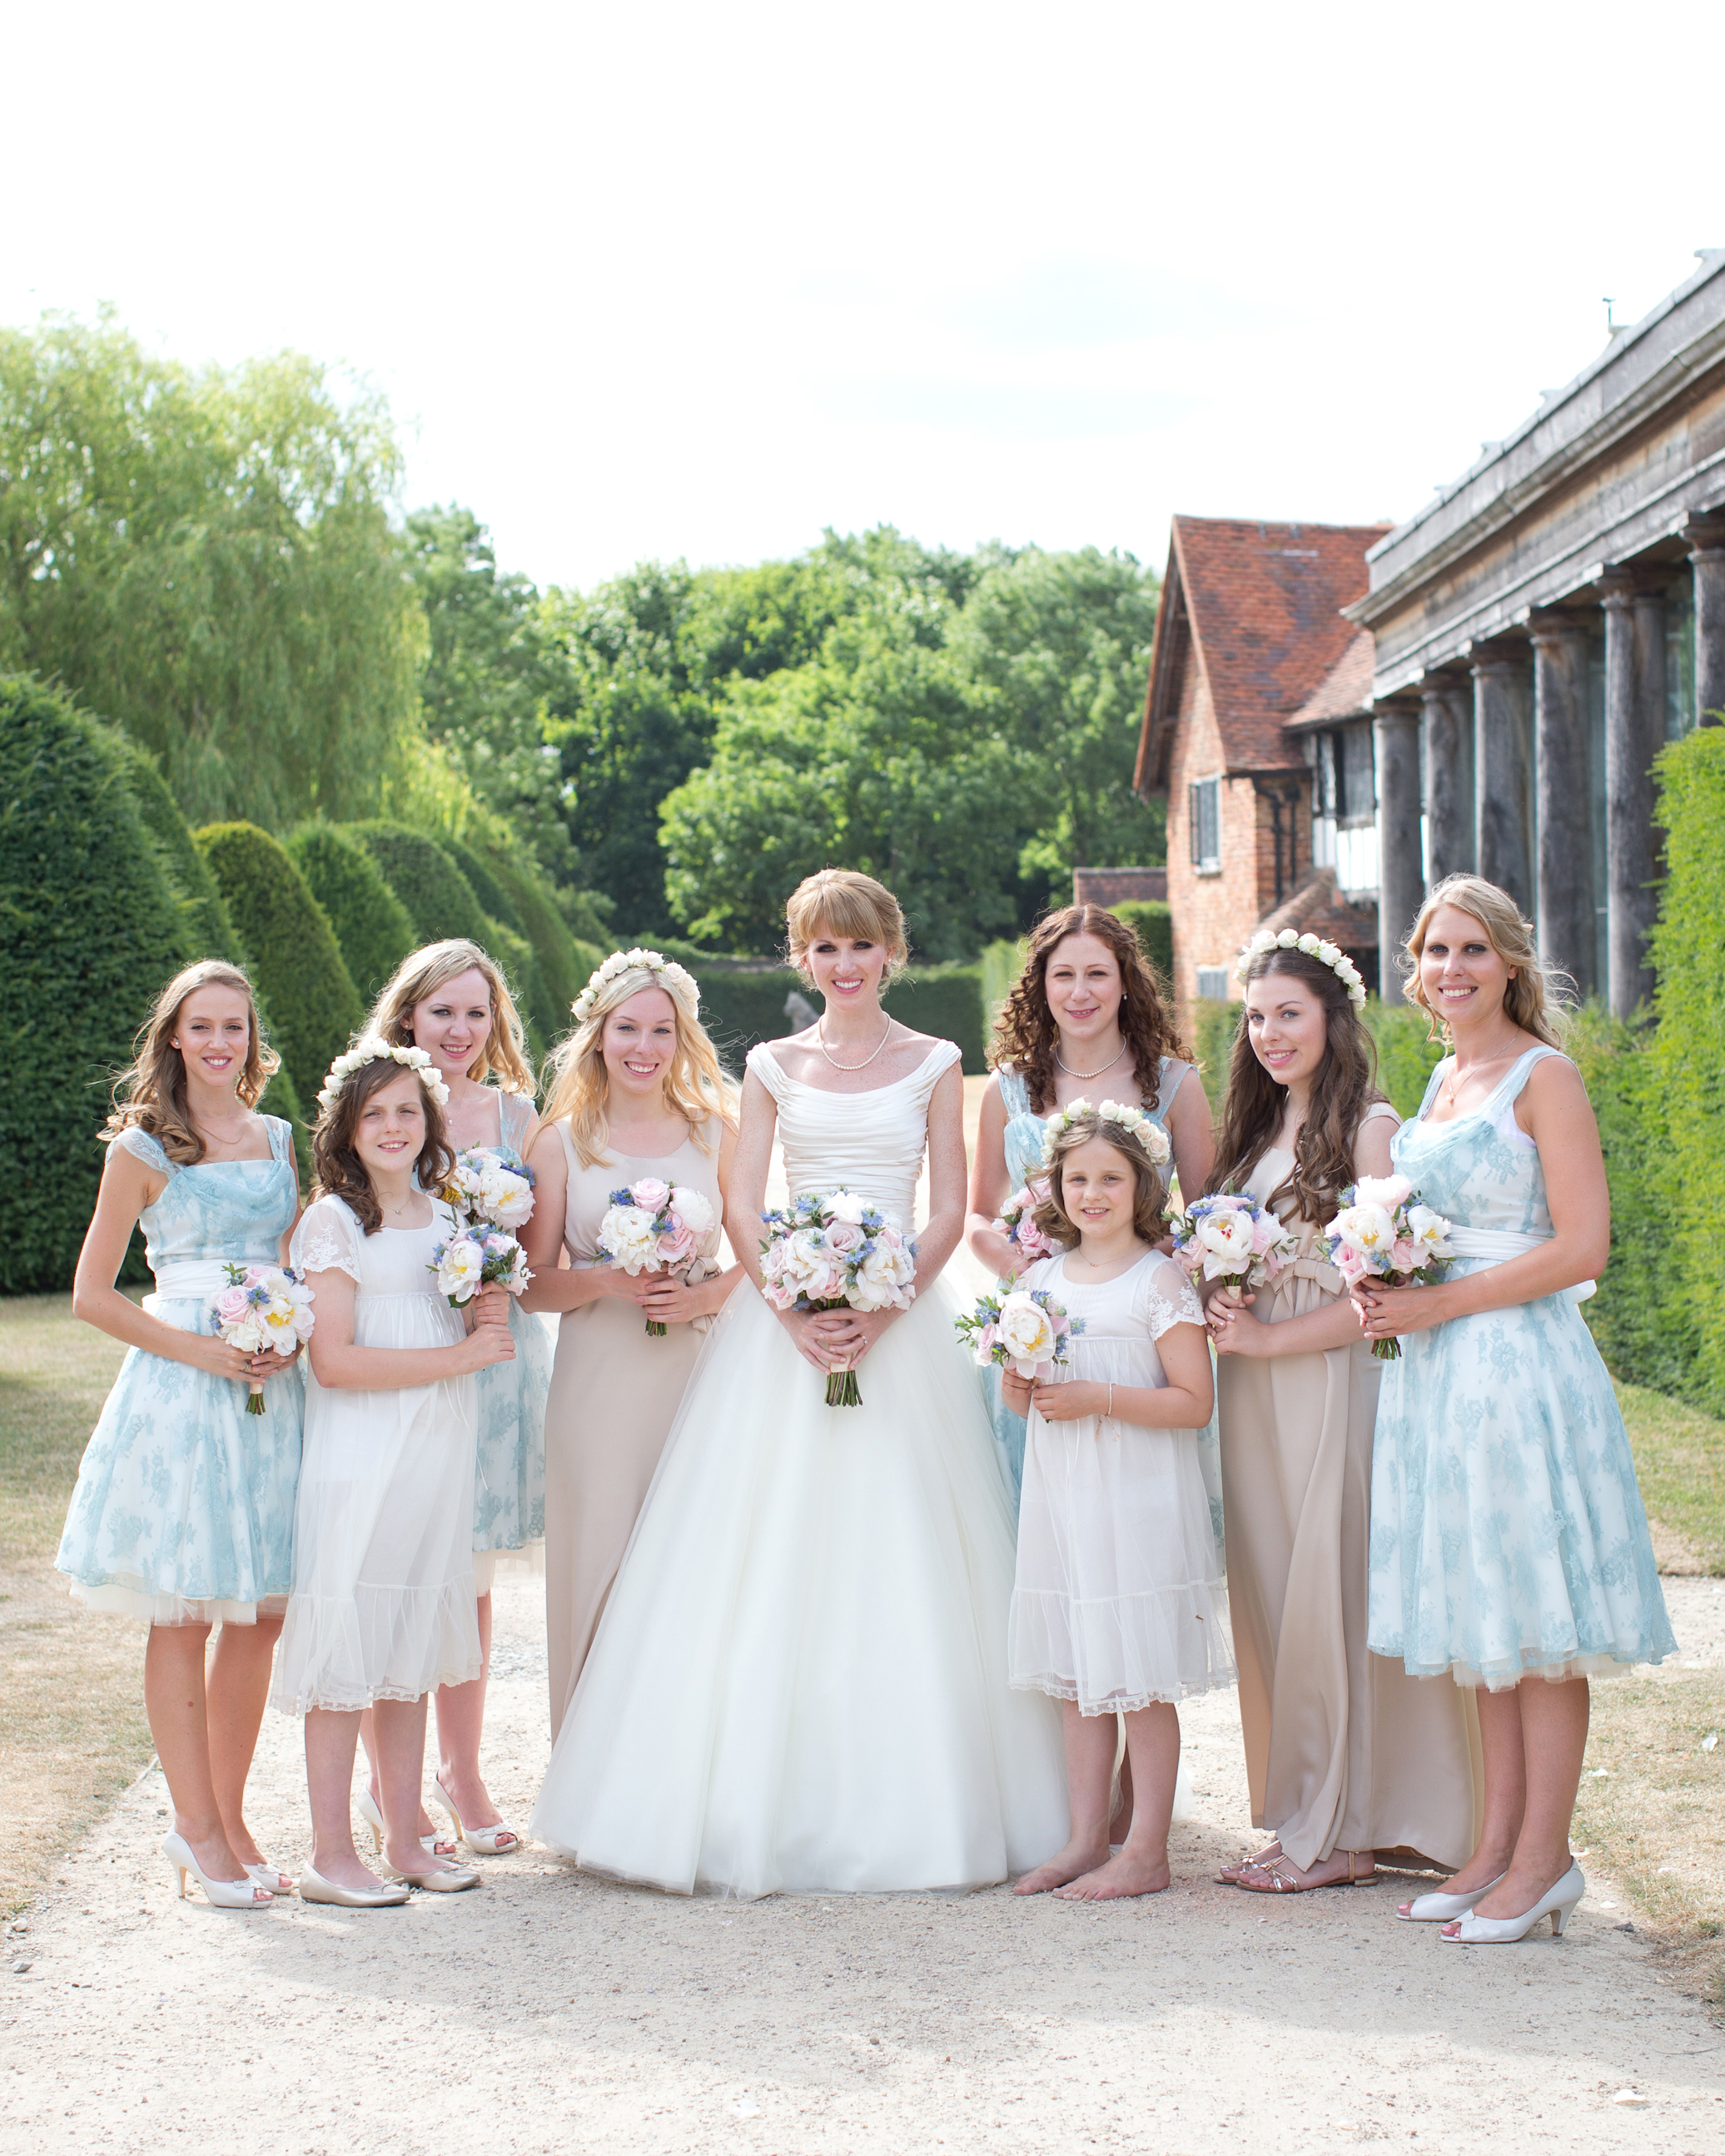 hayley-andrew-wedding-bridesmaids-0714.jpg